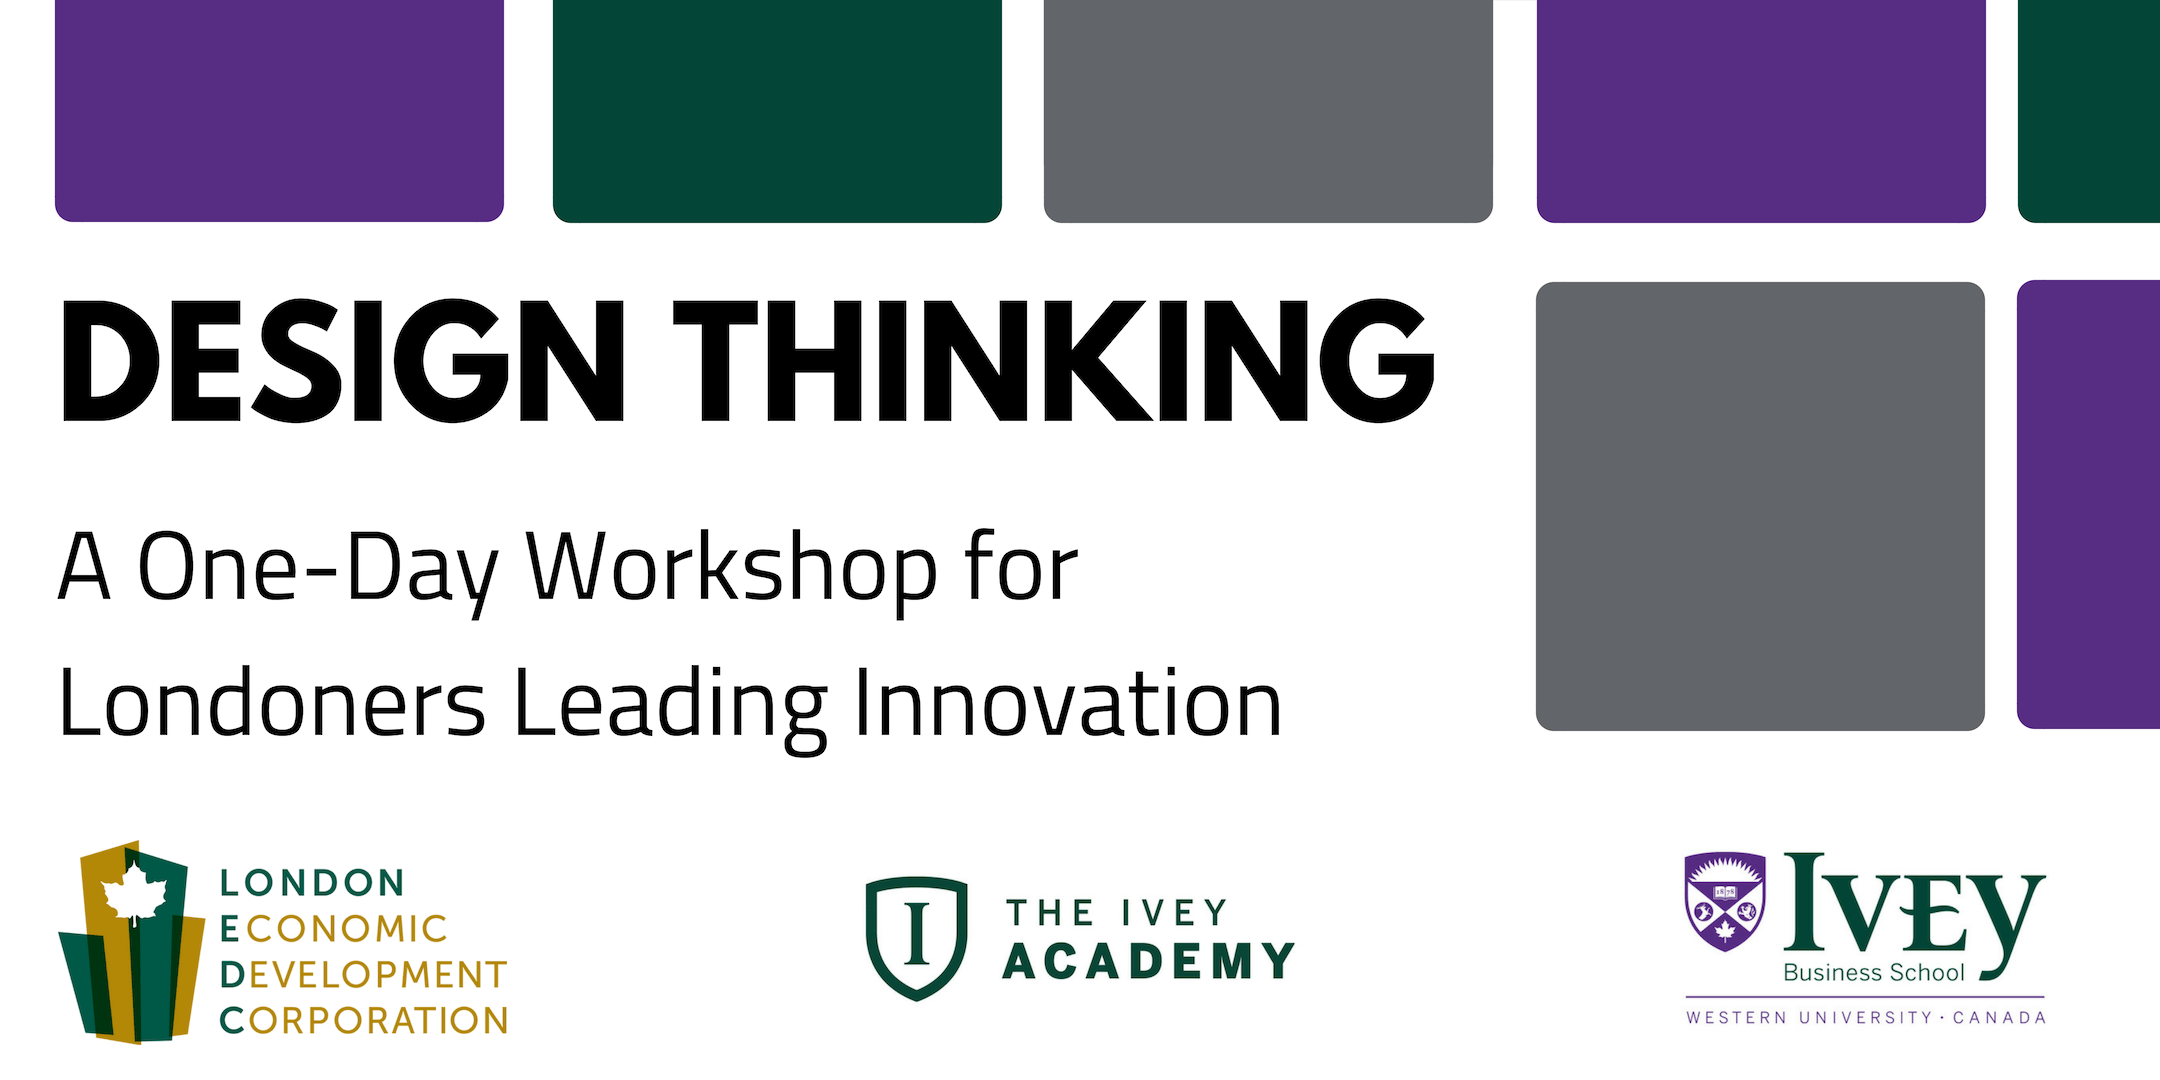 Design Thinking: Driving Innovation